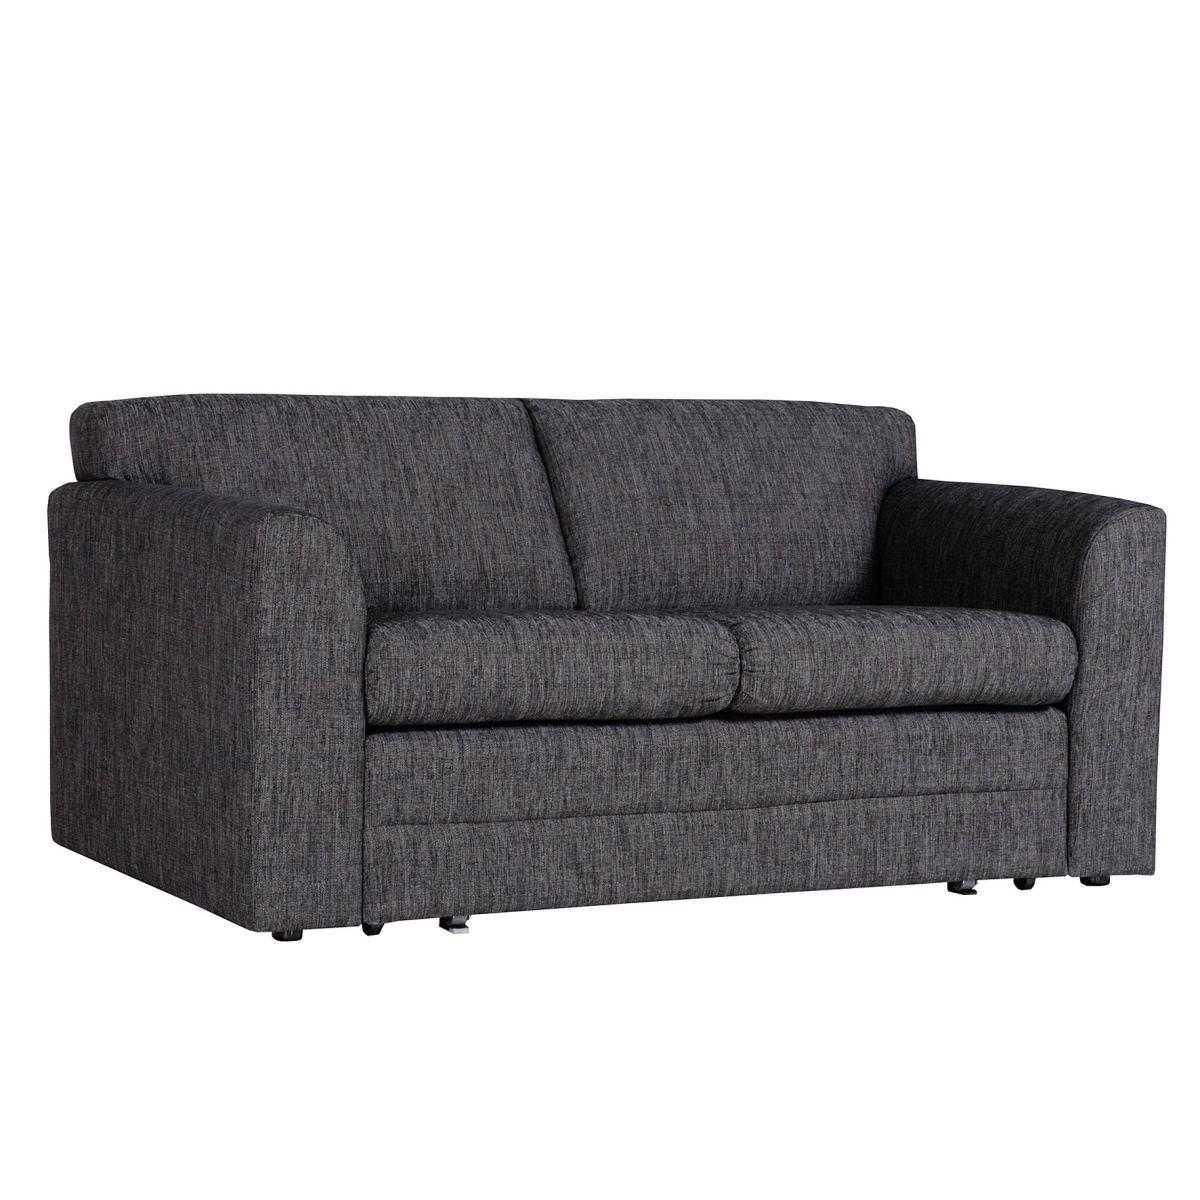 schlafsofa napoleon in grau porta porta m belshop. Black Bedroom Furniture Sets. Home Design Ideas